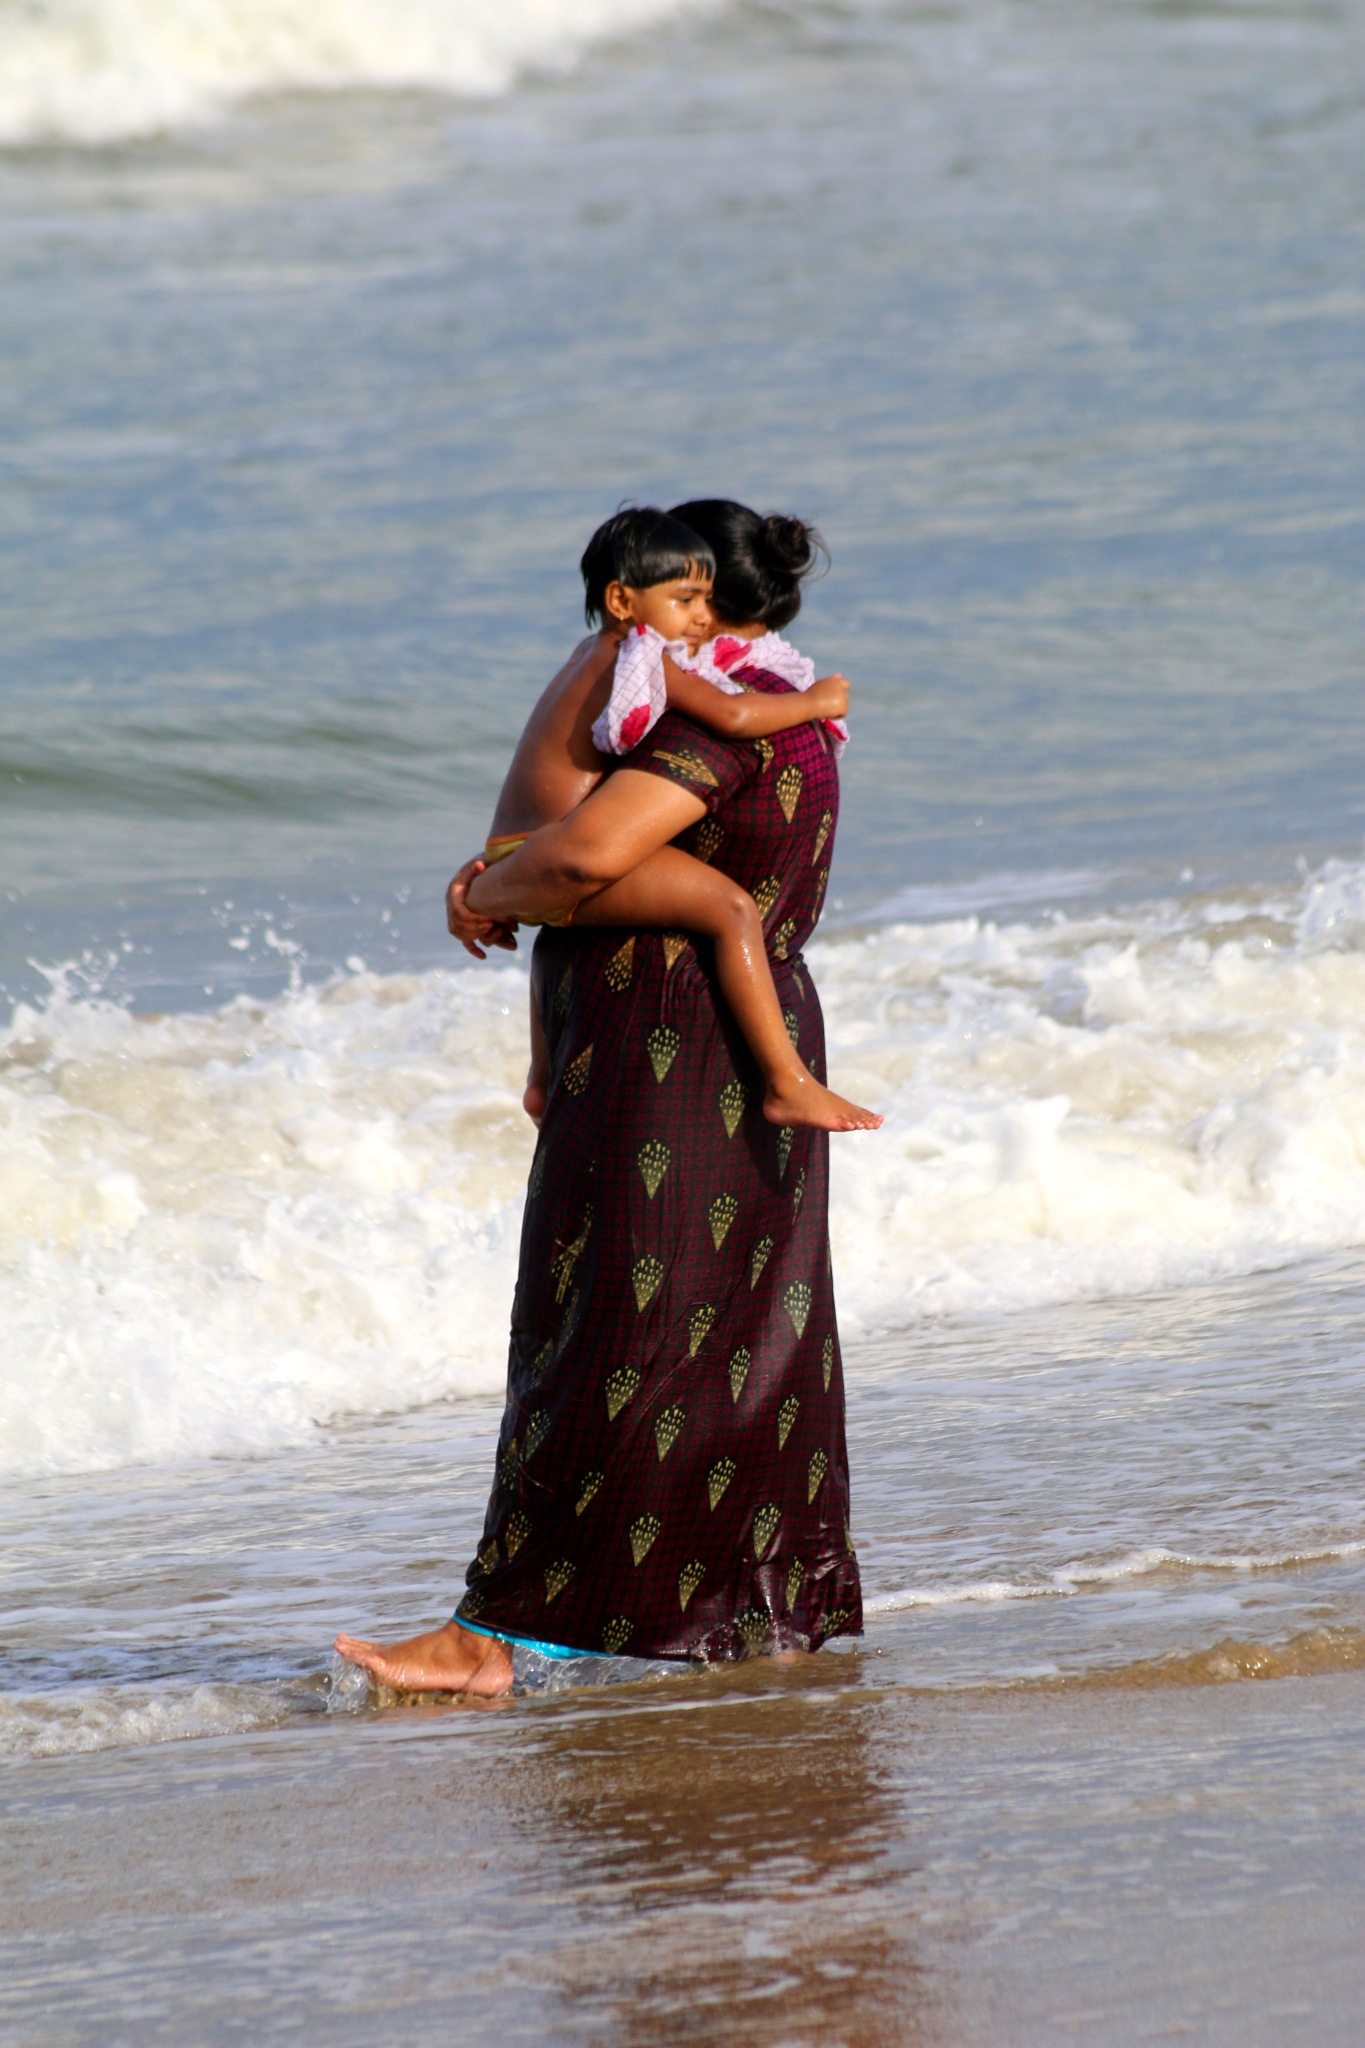 Chennai beach -India  # 8 by  Itzkovich  Joseph